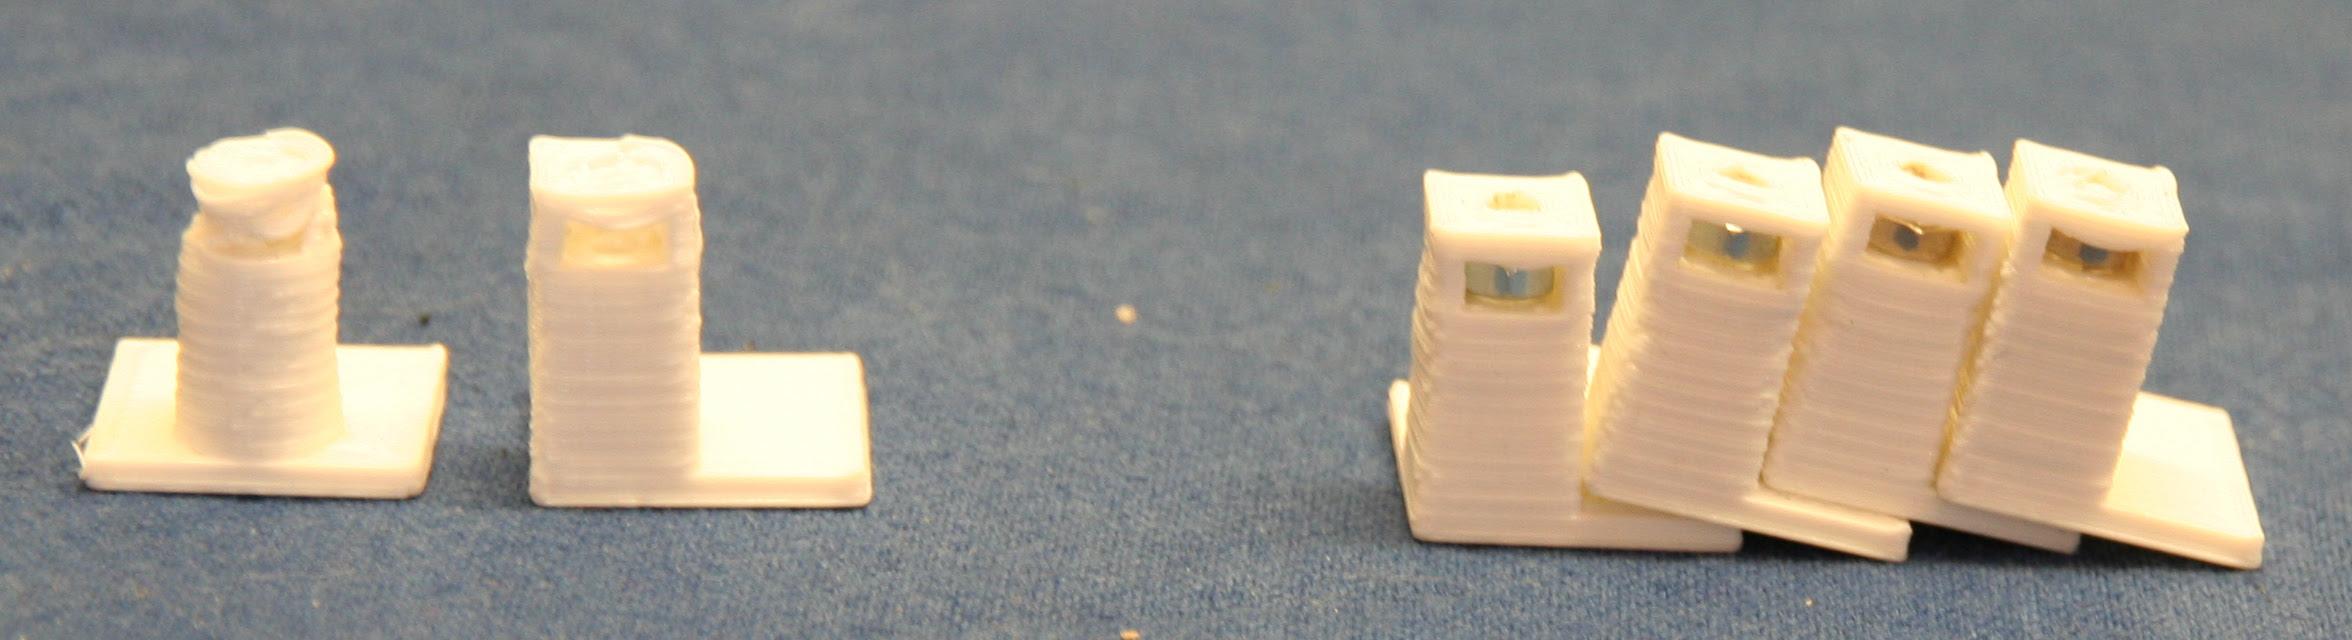 Evolution of 3mm PCB pillars